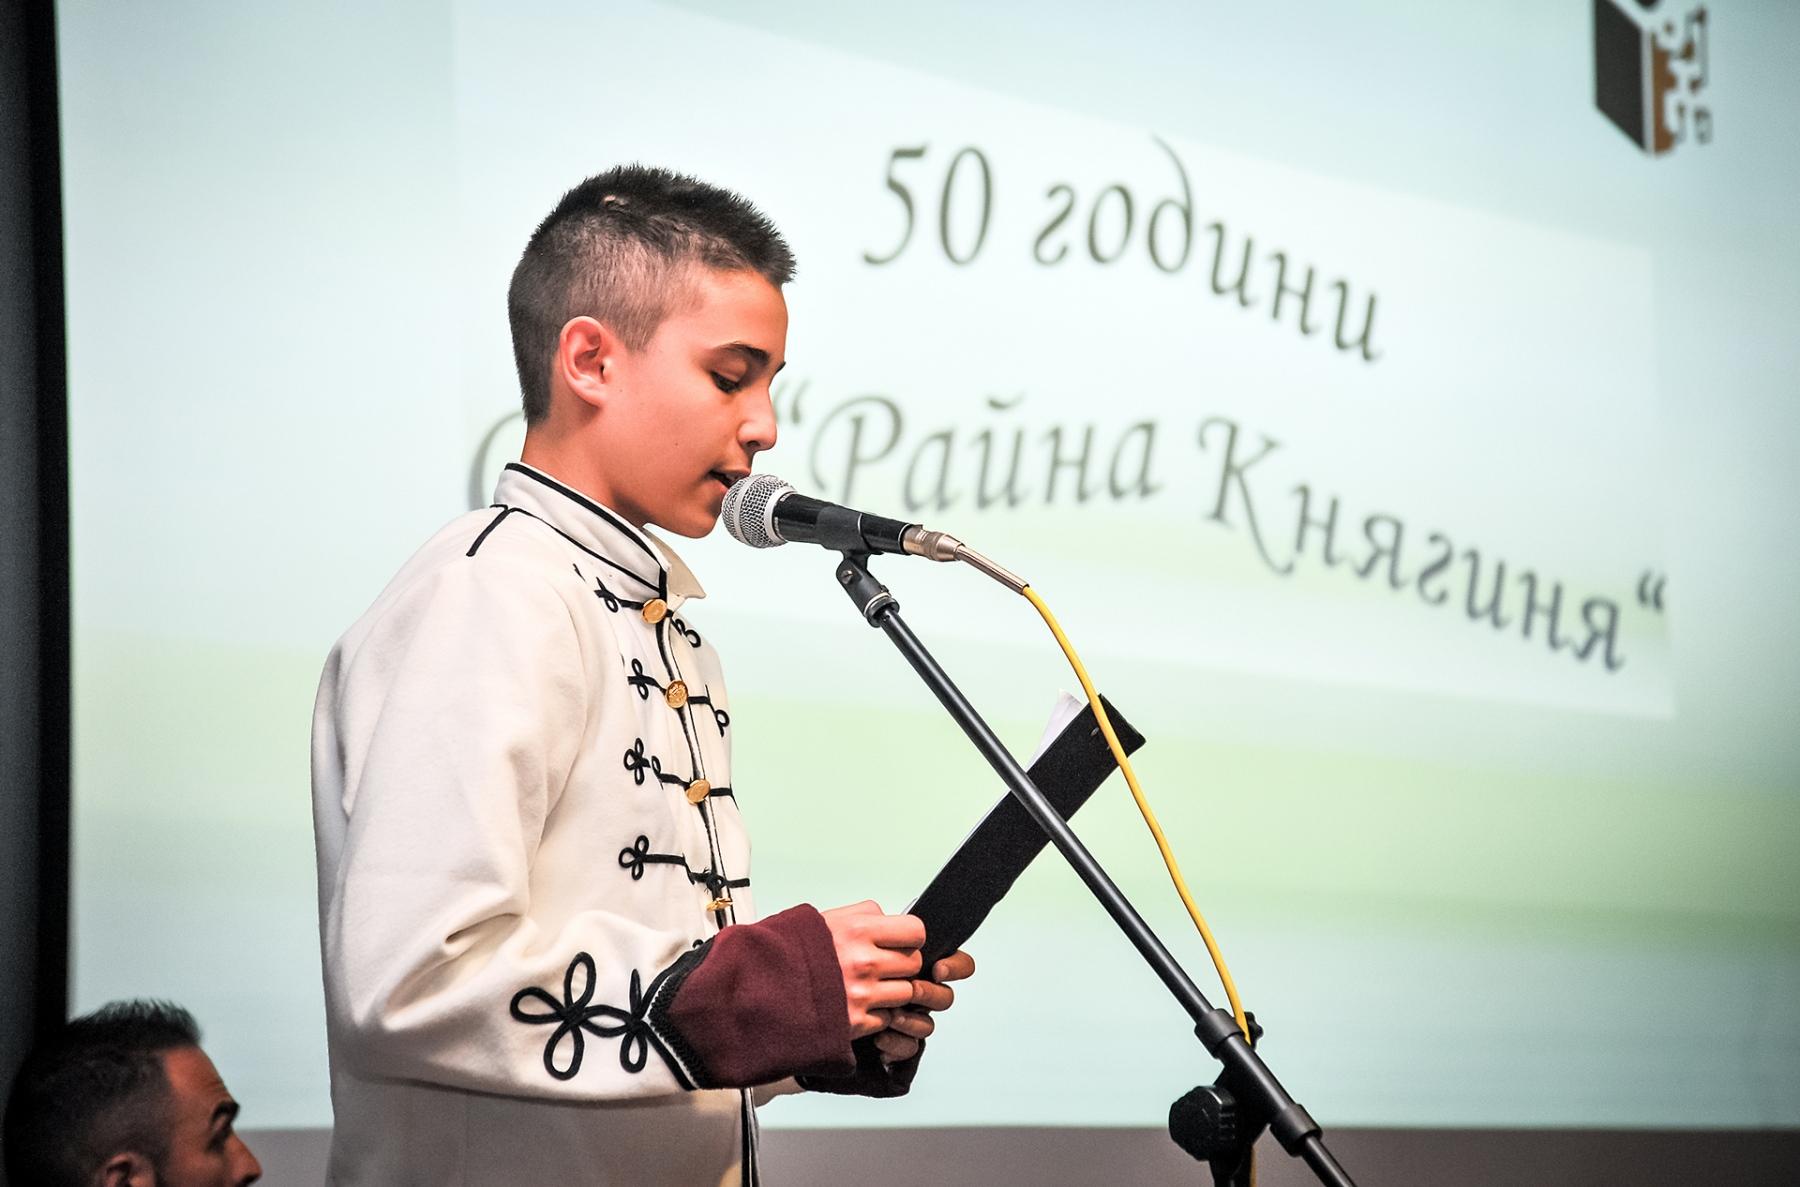 fg39-2020-patron-saint39-2020-patron-saint-02